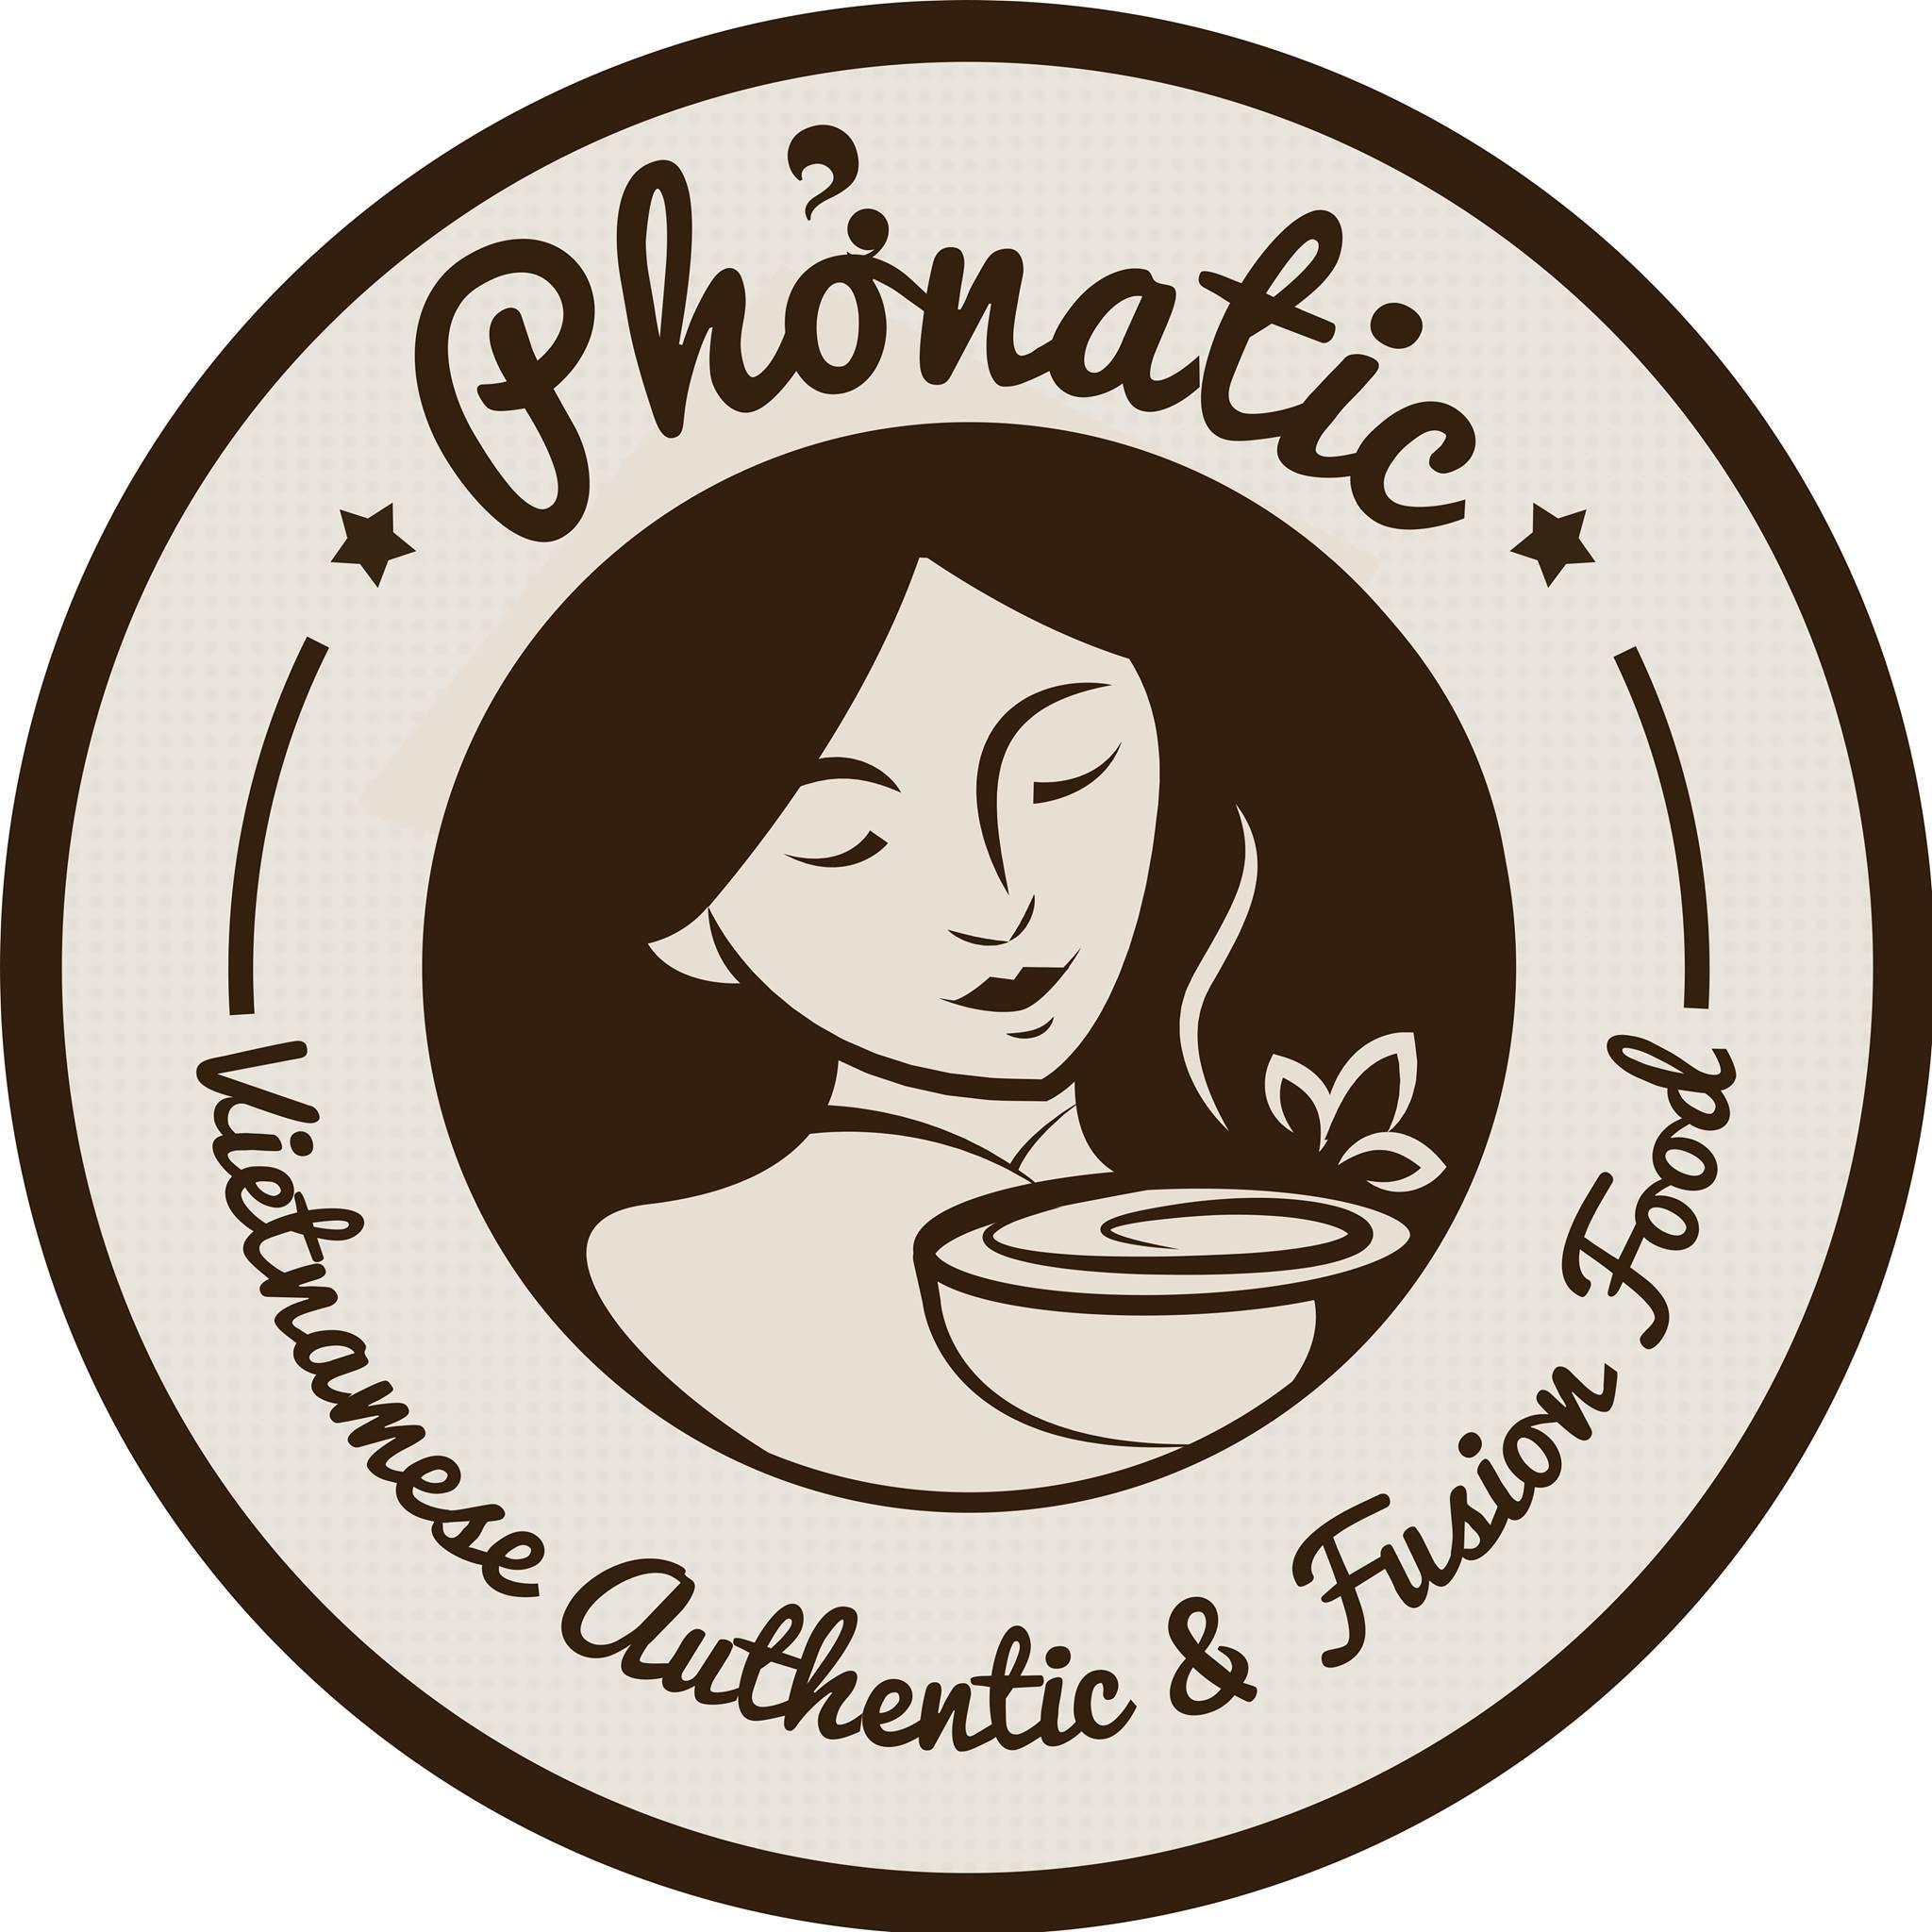 Phonatic logo